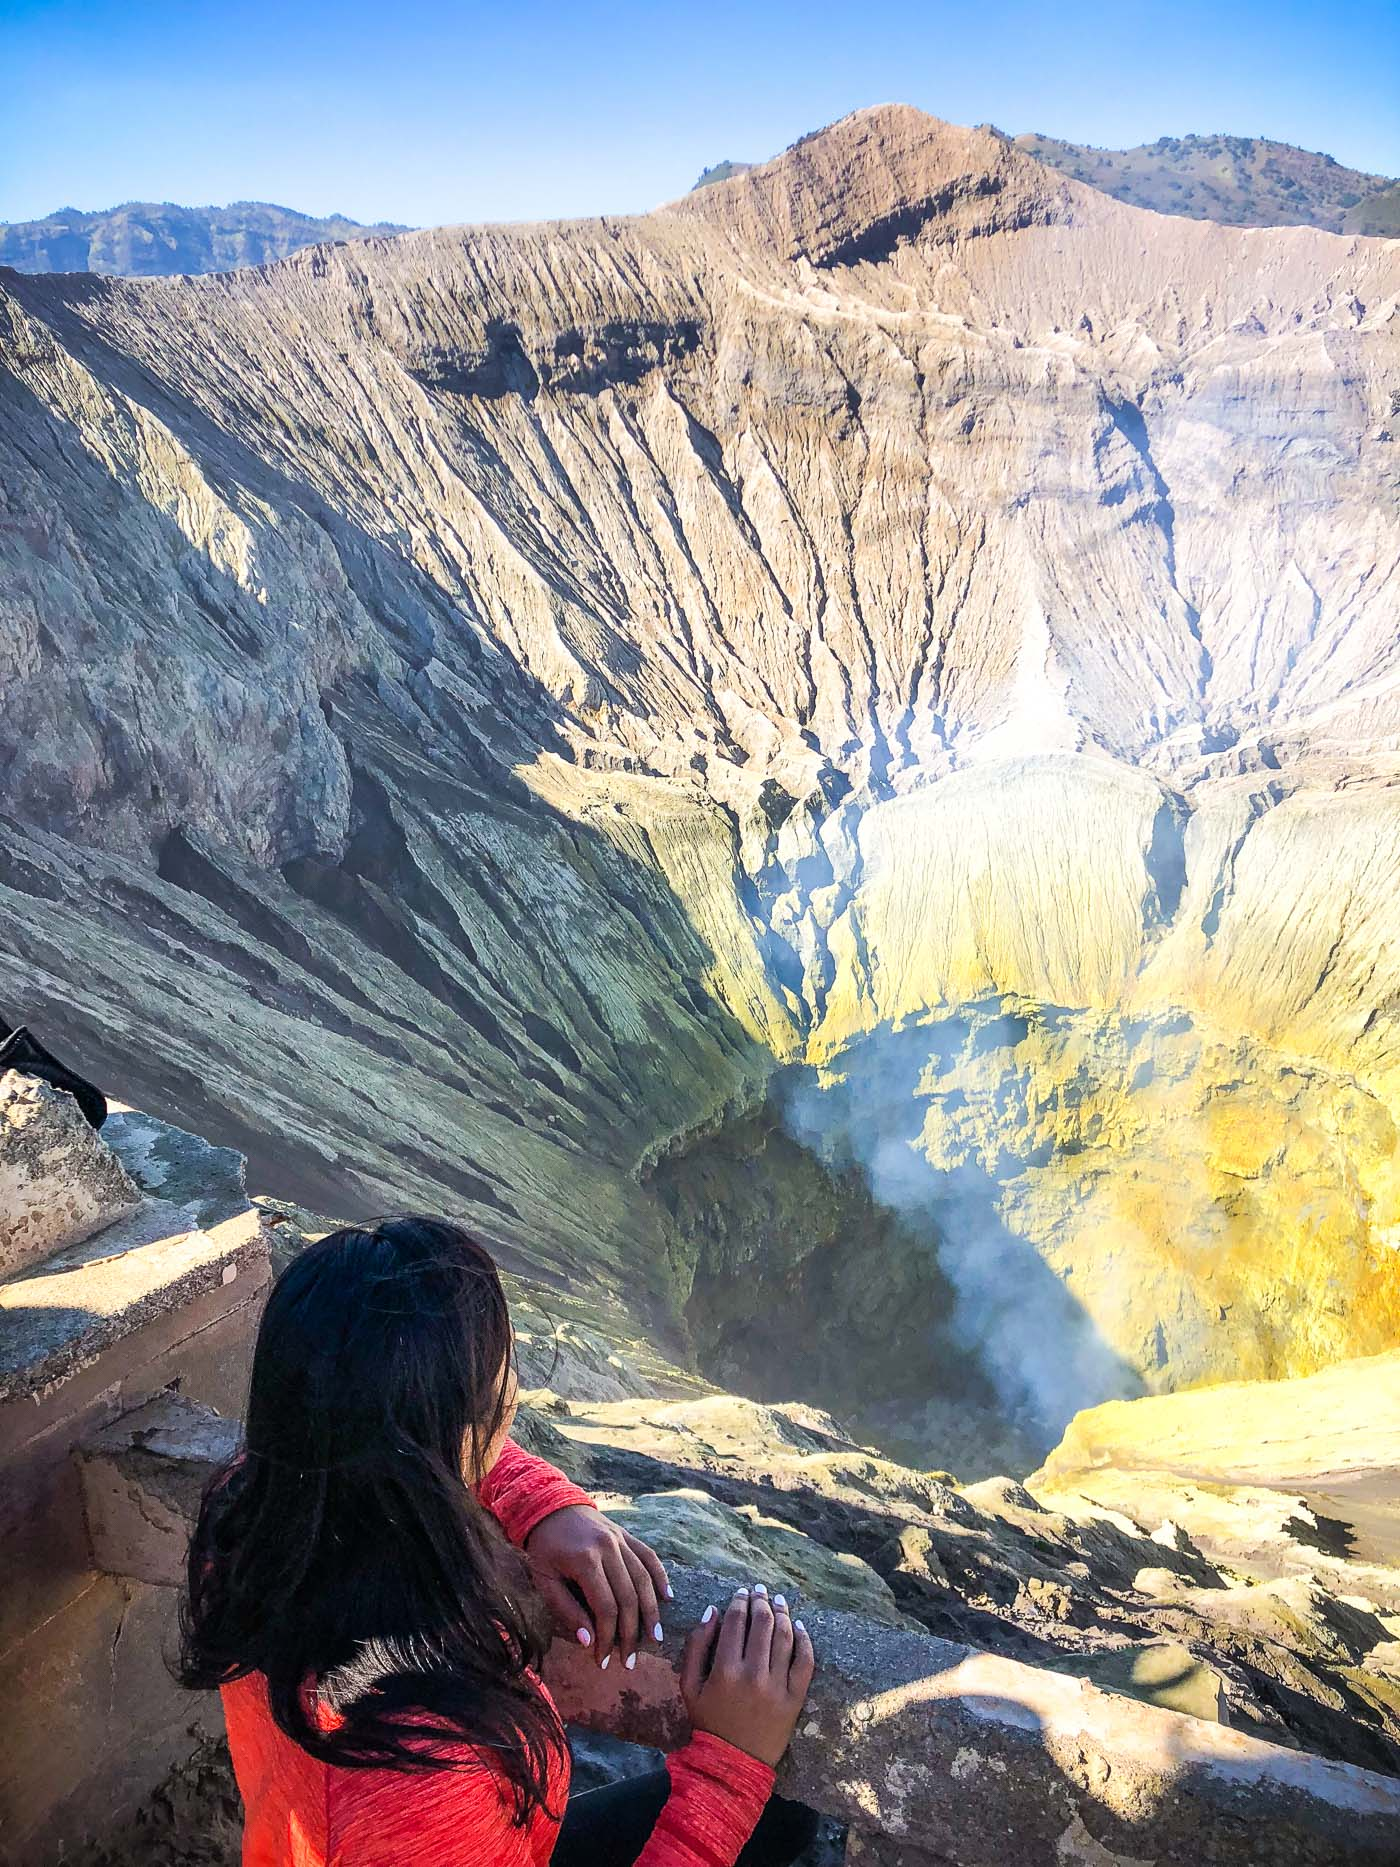 Mount_Bromo_Java_Indonesia_Active_Volcano_Hiking_Trekking_Solo_Travel_Blogger_The_Sassy_Pilgrim_Travel_Tips_Guide_Kawah_Ijen_Sulphuric_Lakes_Sunrise